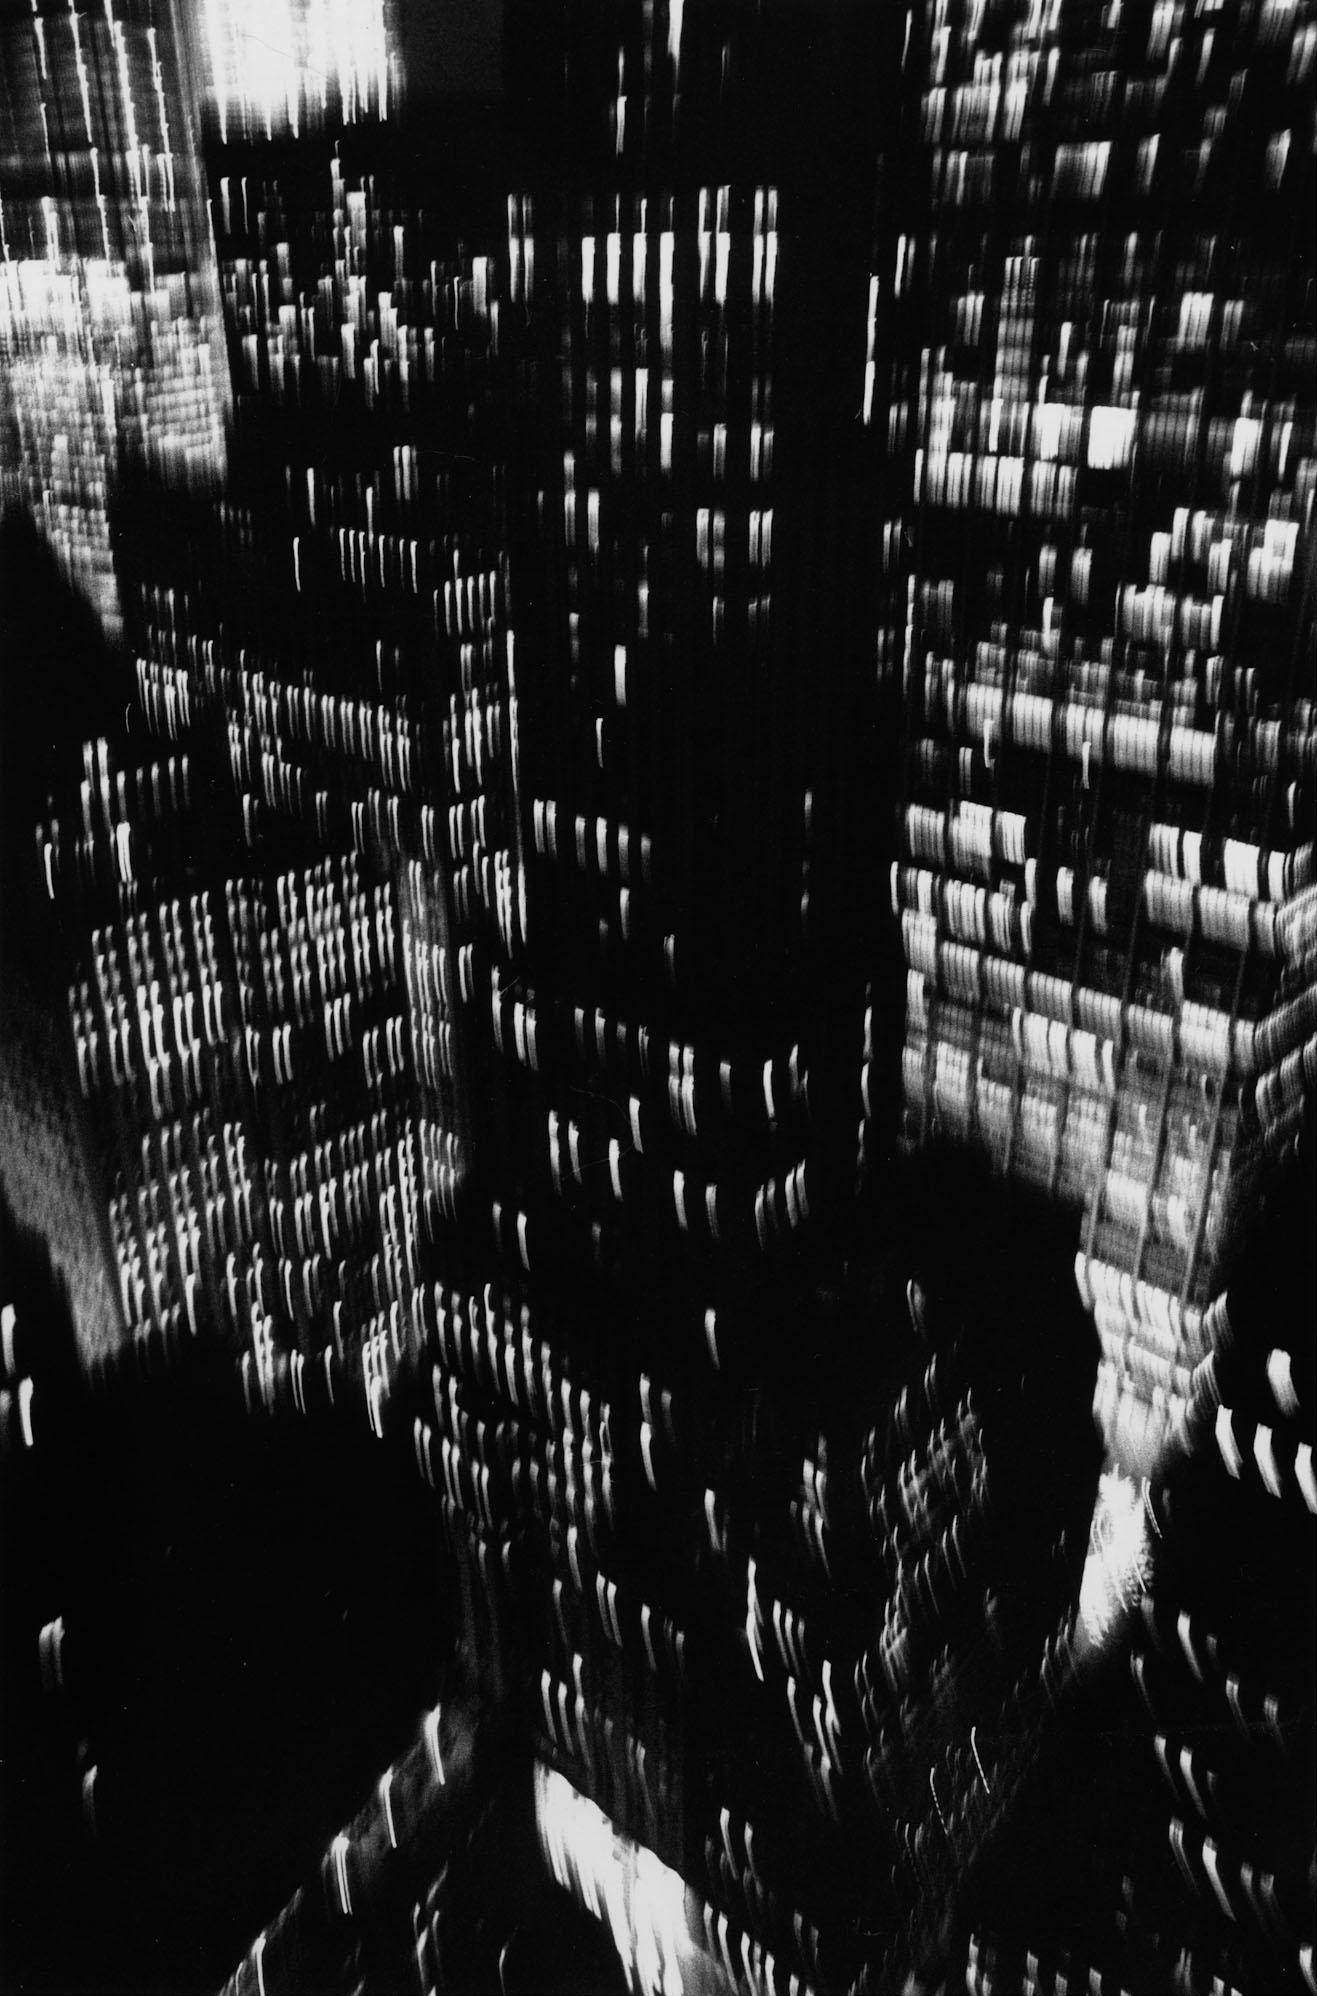 New-york-noir-cooper-ray-17